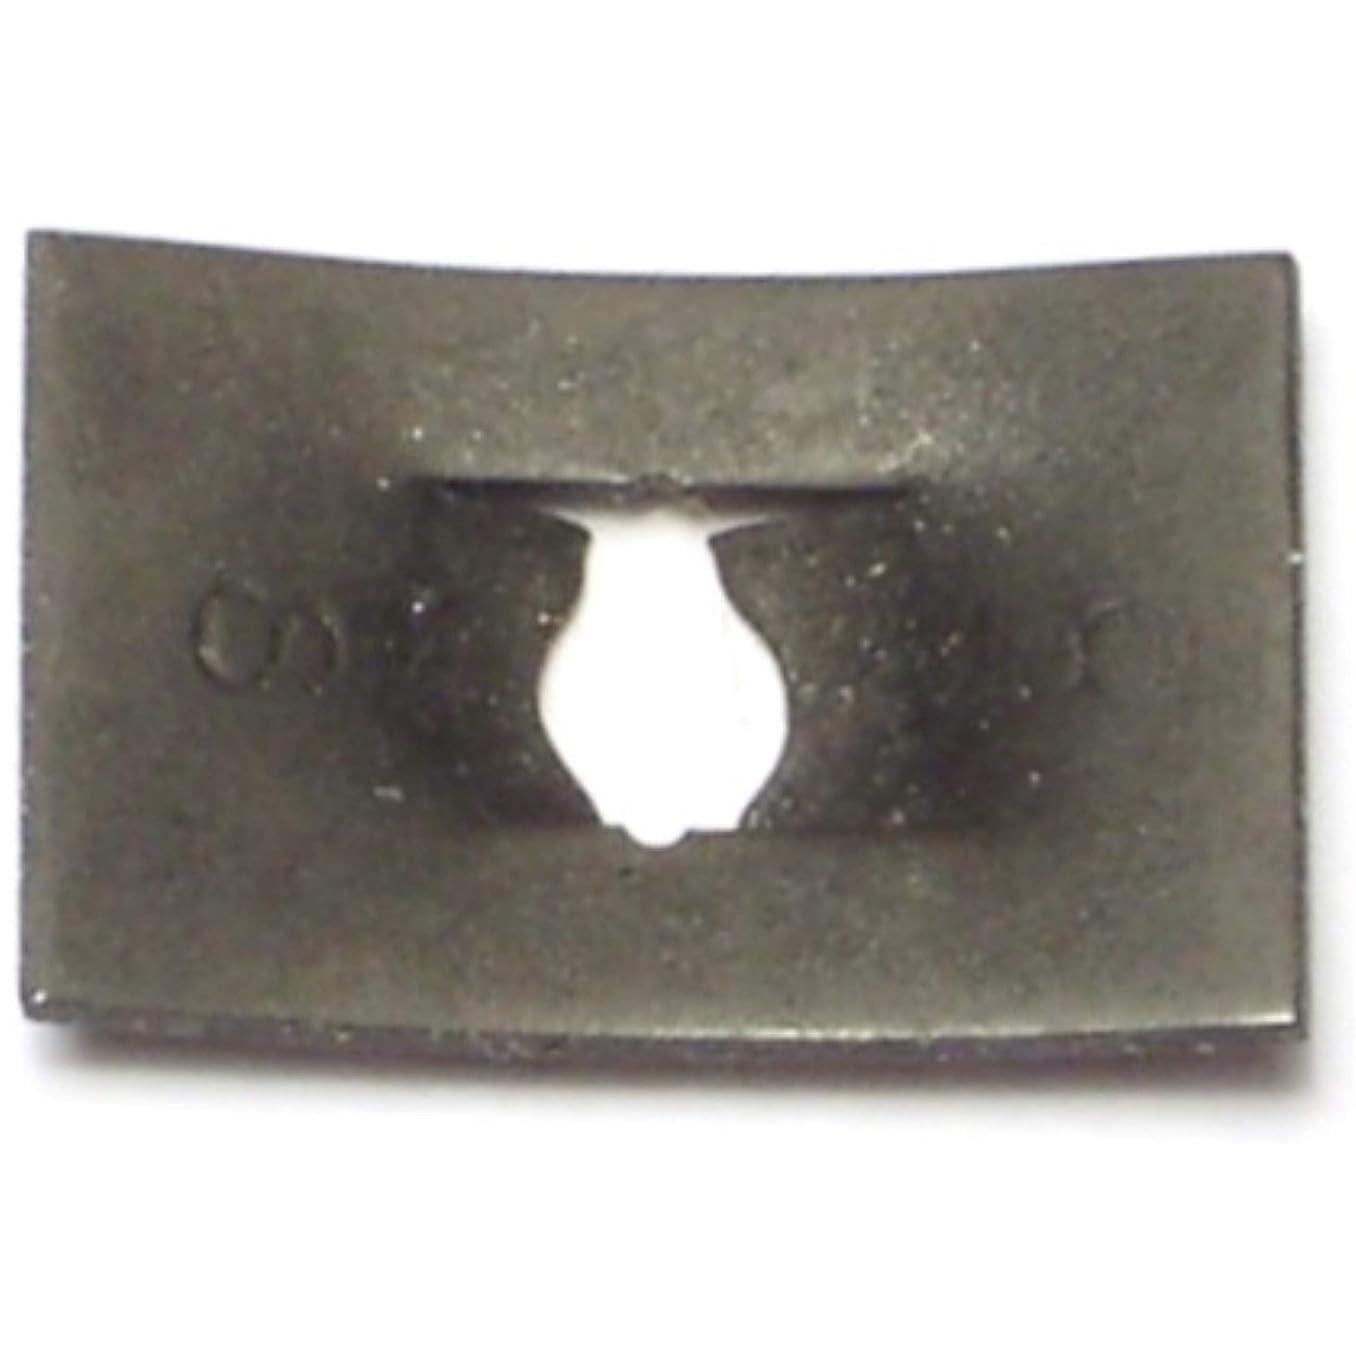 Hard-to-Find Fastener 014973324360 Flat Speed Nuts for Sheet Metal Screws, 8, Piece-48